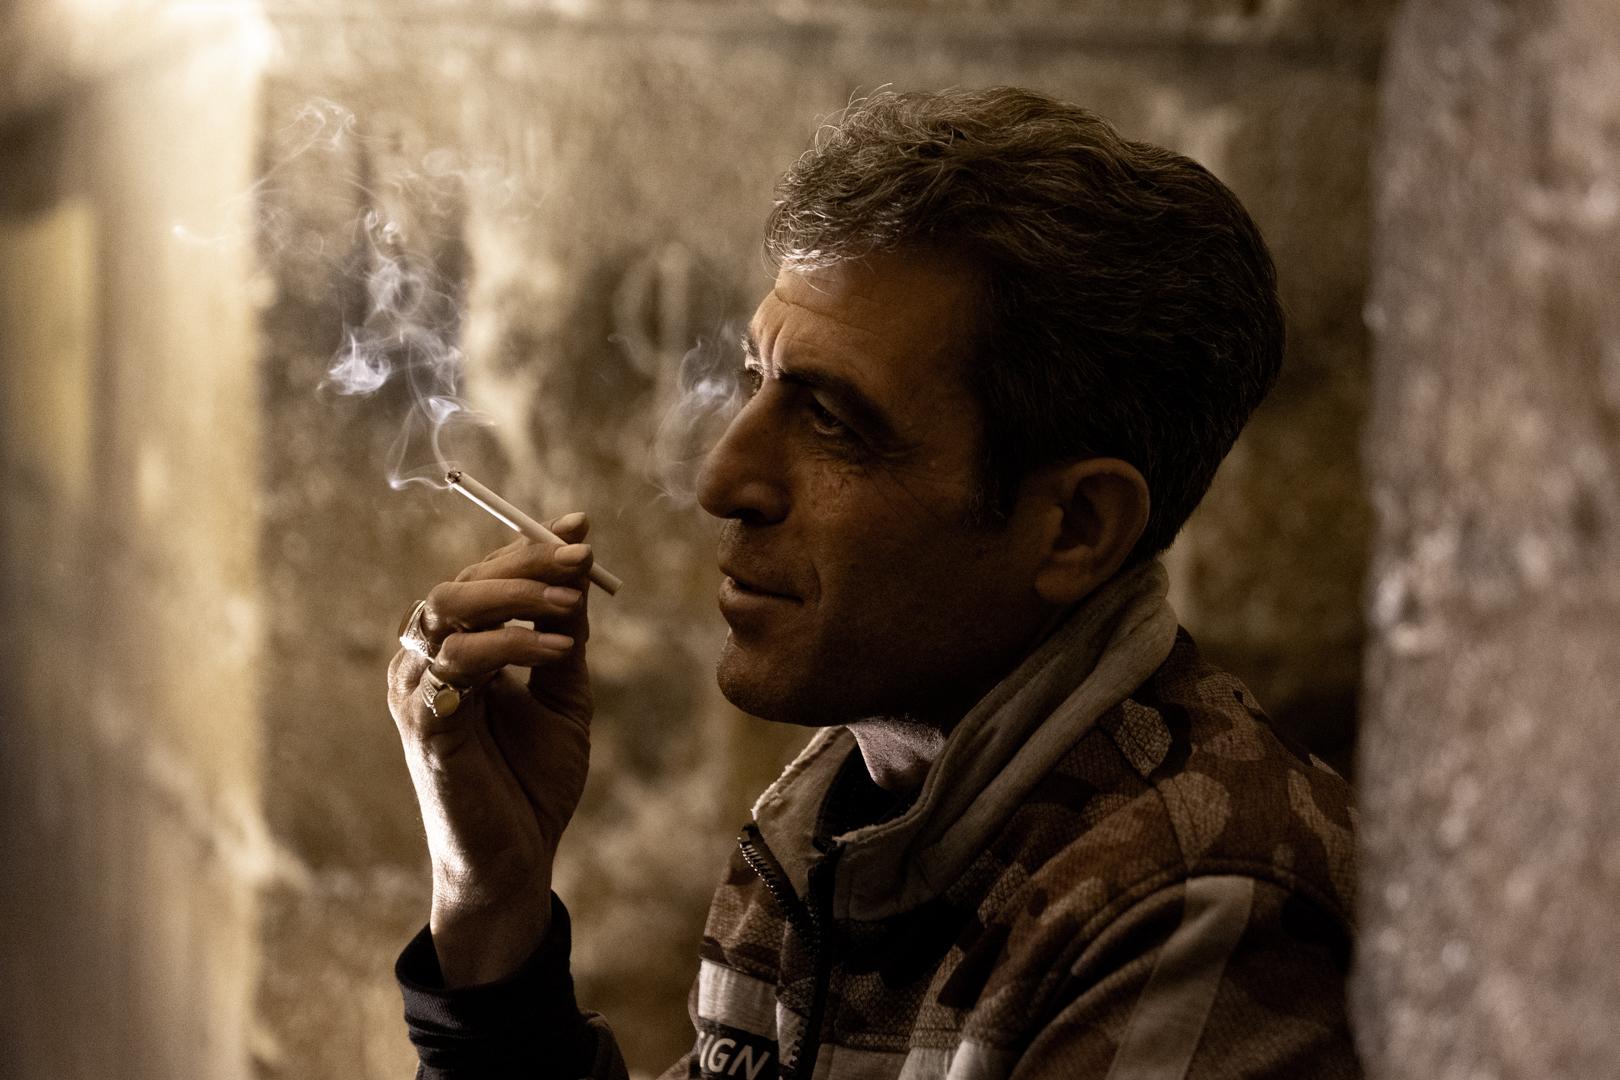 A man enjoying his cigerette, watching the show of performers under the Khaju bridge, Isfahan, Iran